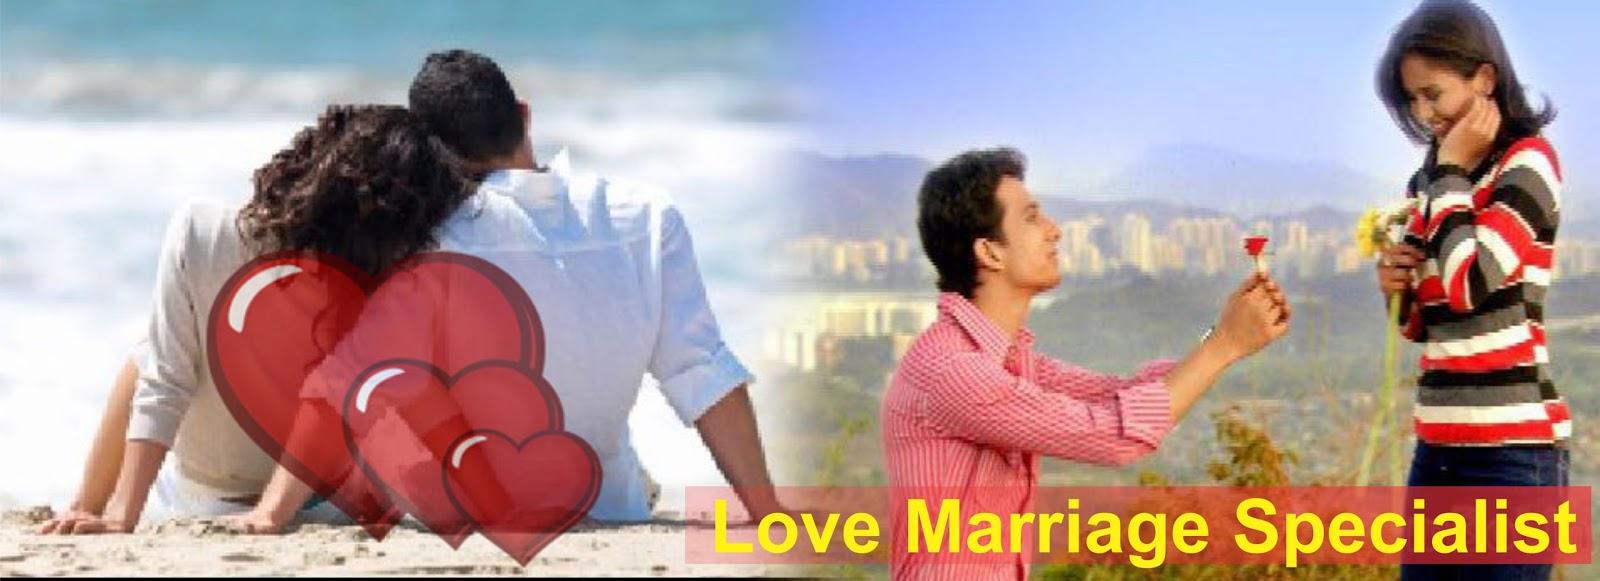 Love Marriage Vashikaran Specialist in Mumbai, Delhi, Punjab